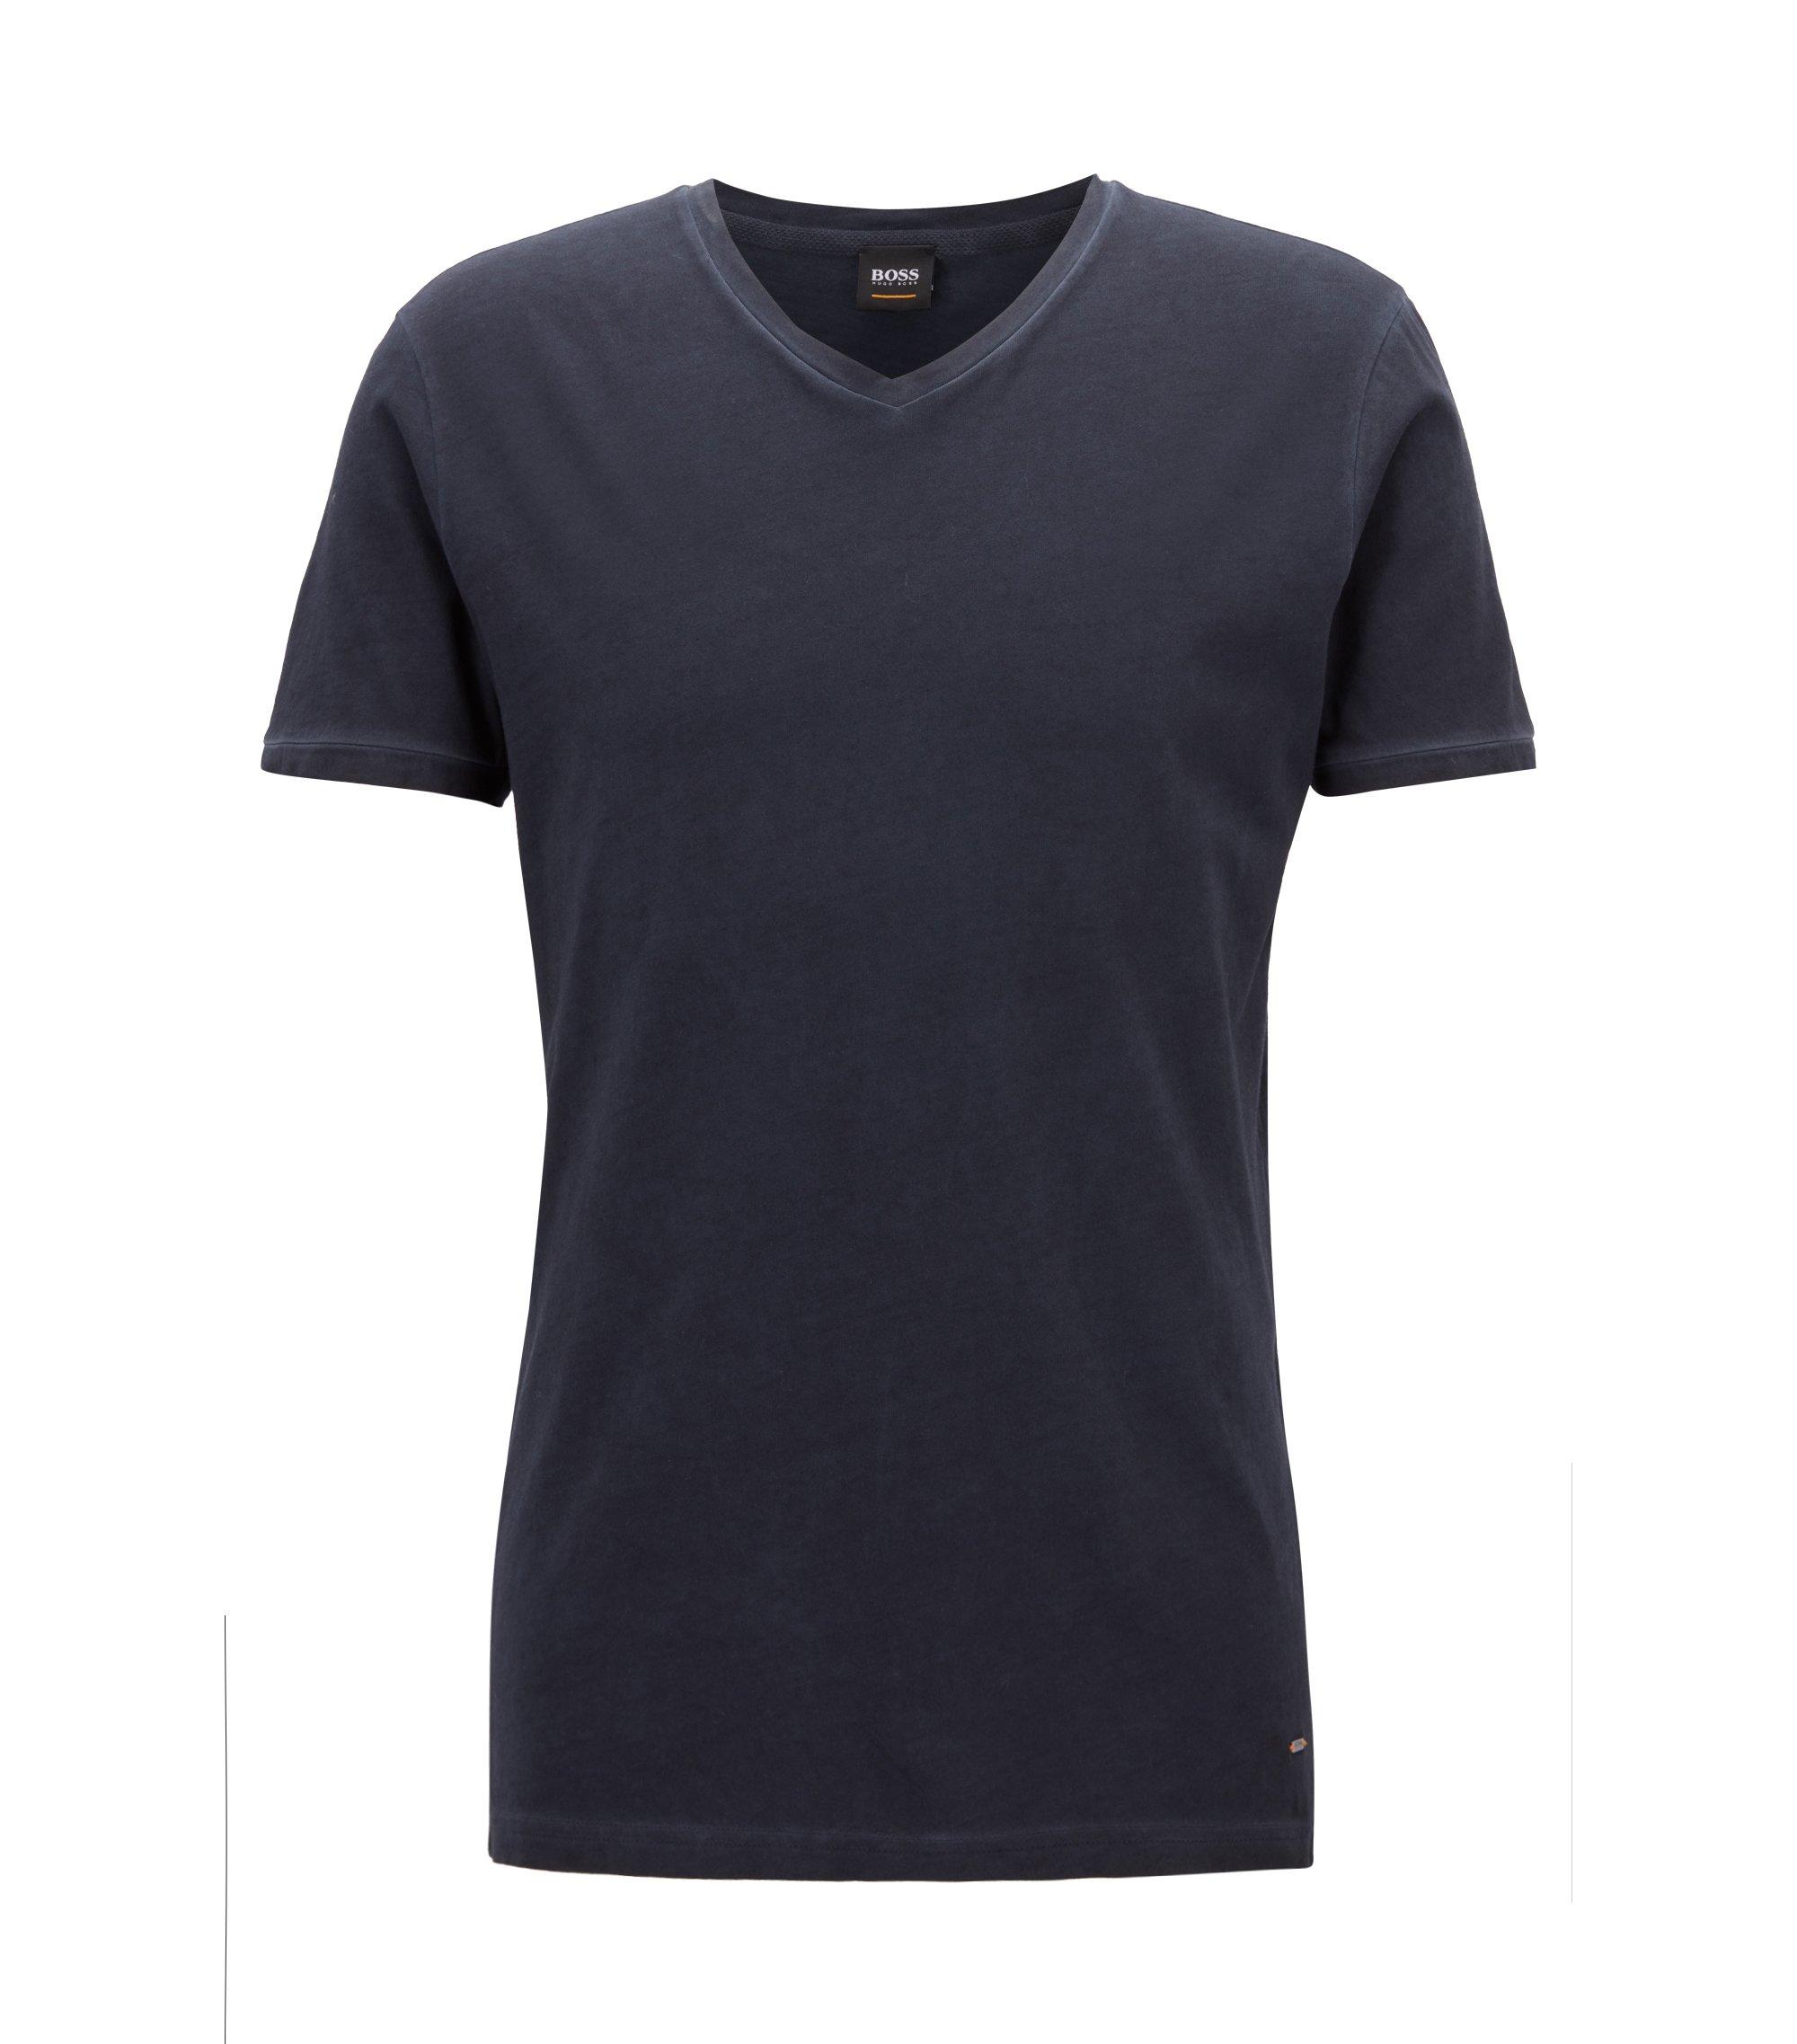 Regular-Fit T-Shirt aus Baumwolle mit V-Ausschnitt, Dunkelblau